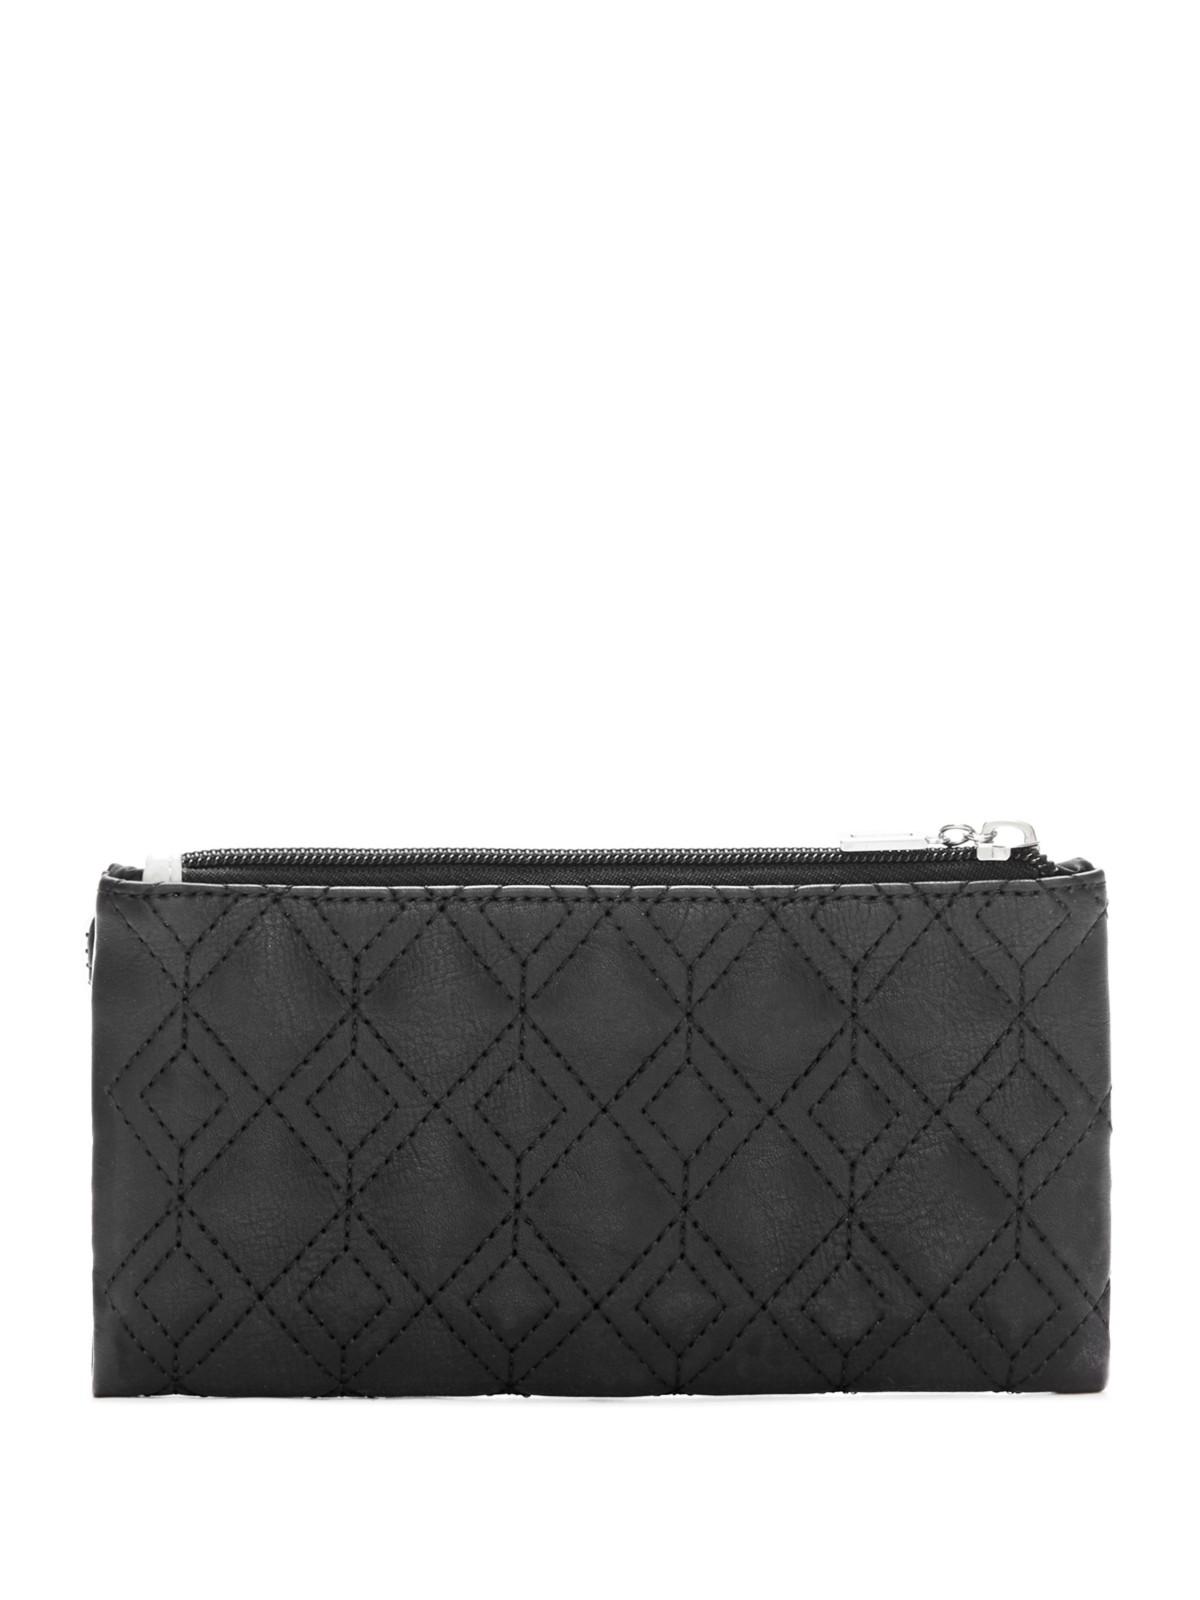 GUESS Women's Rose Bud Slim Snap Wallet